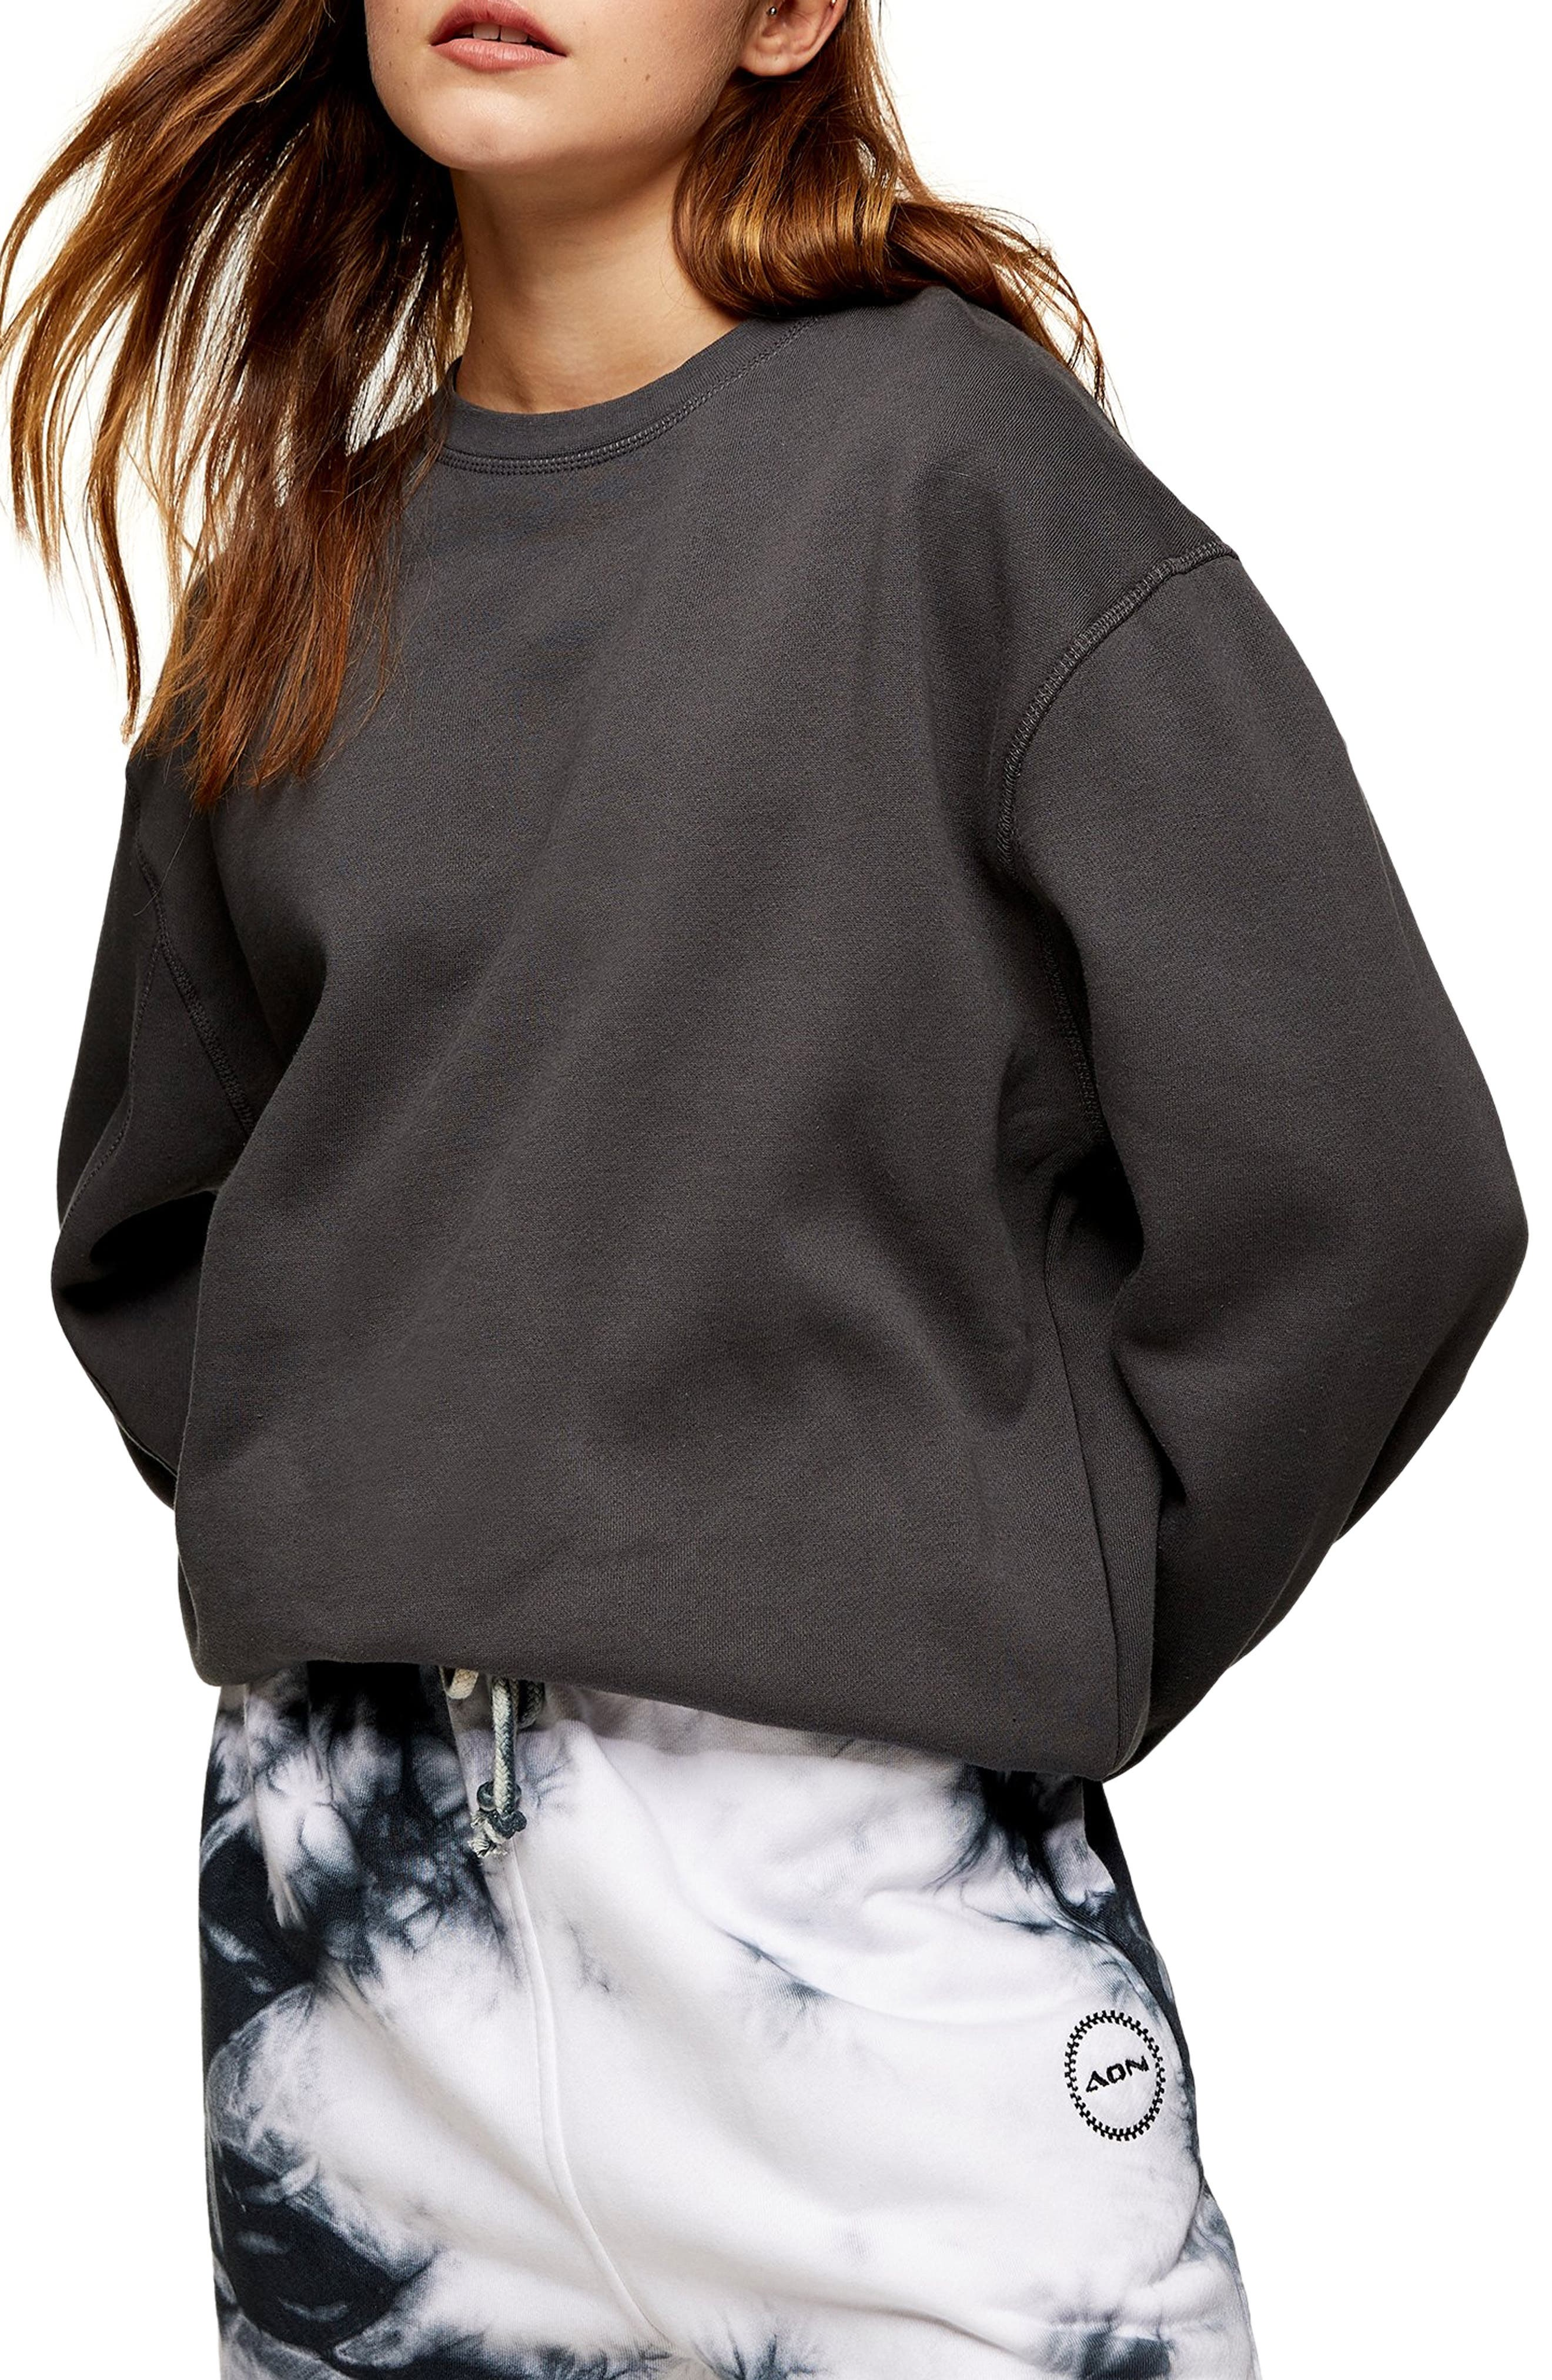 L Vintage Sand Cotton blend V-Neck Knit Top Blouse Shirt Pullover Sweater Sweatshirt S